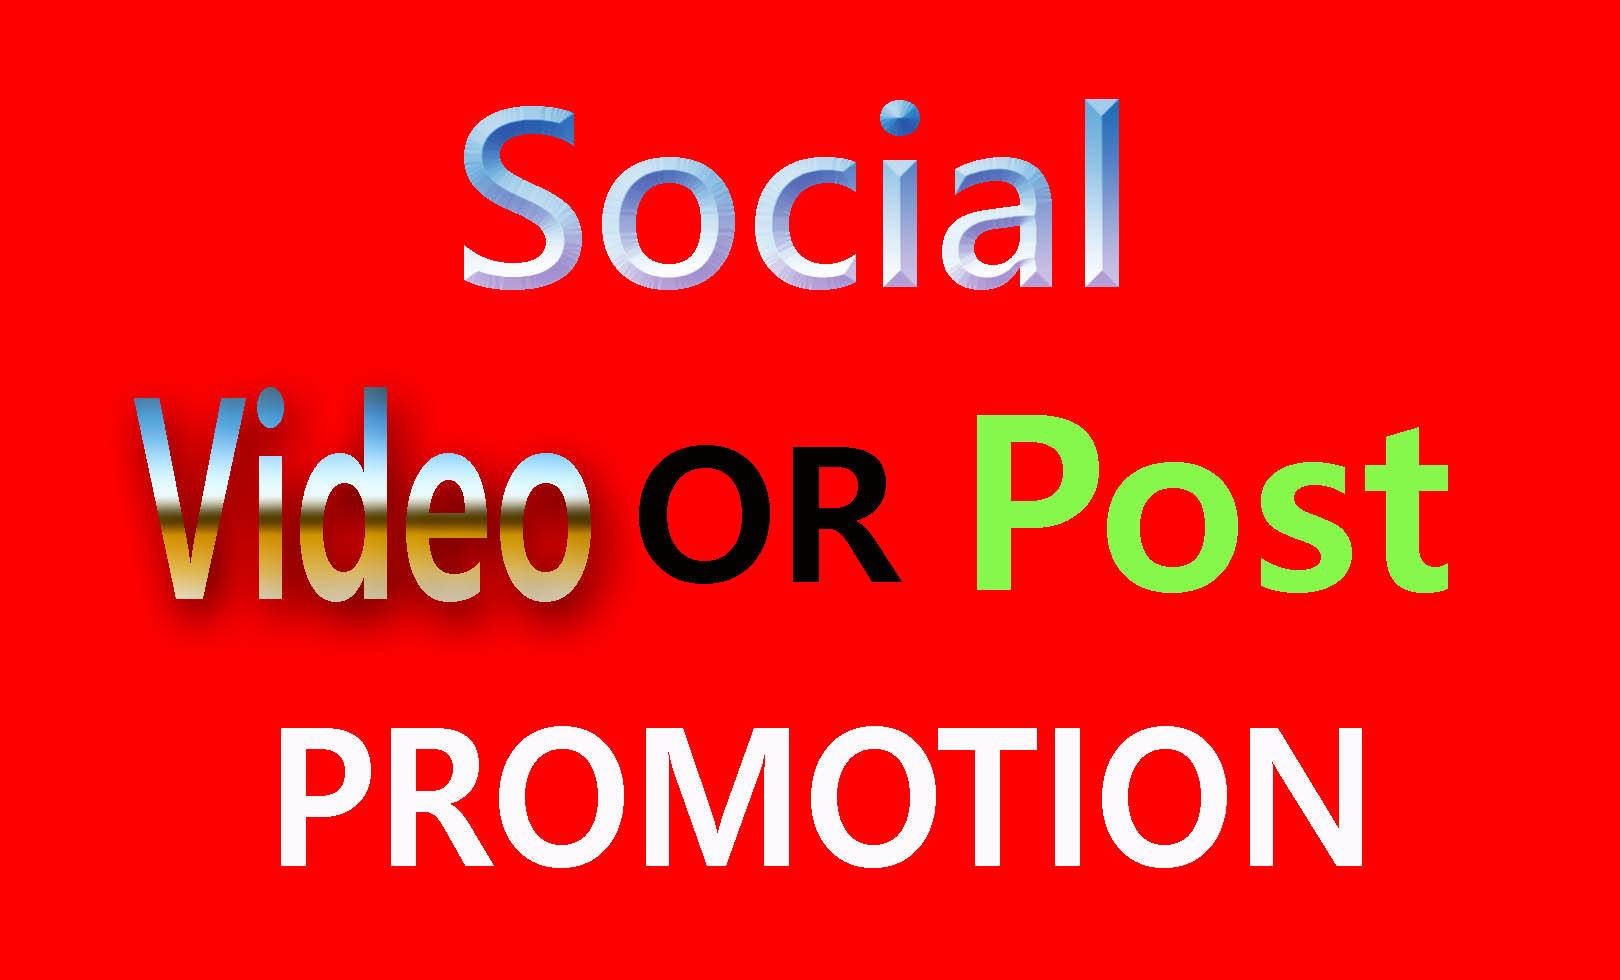 Social Media video Or Post Promotion Via Genuine Users